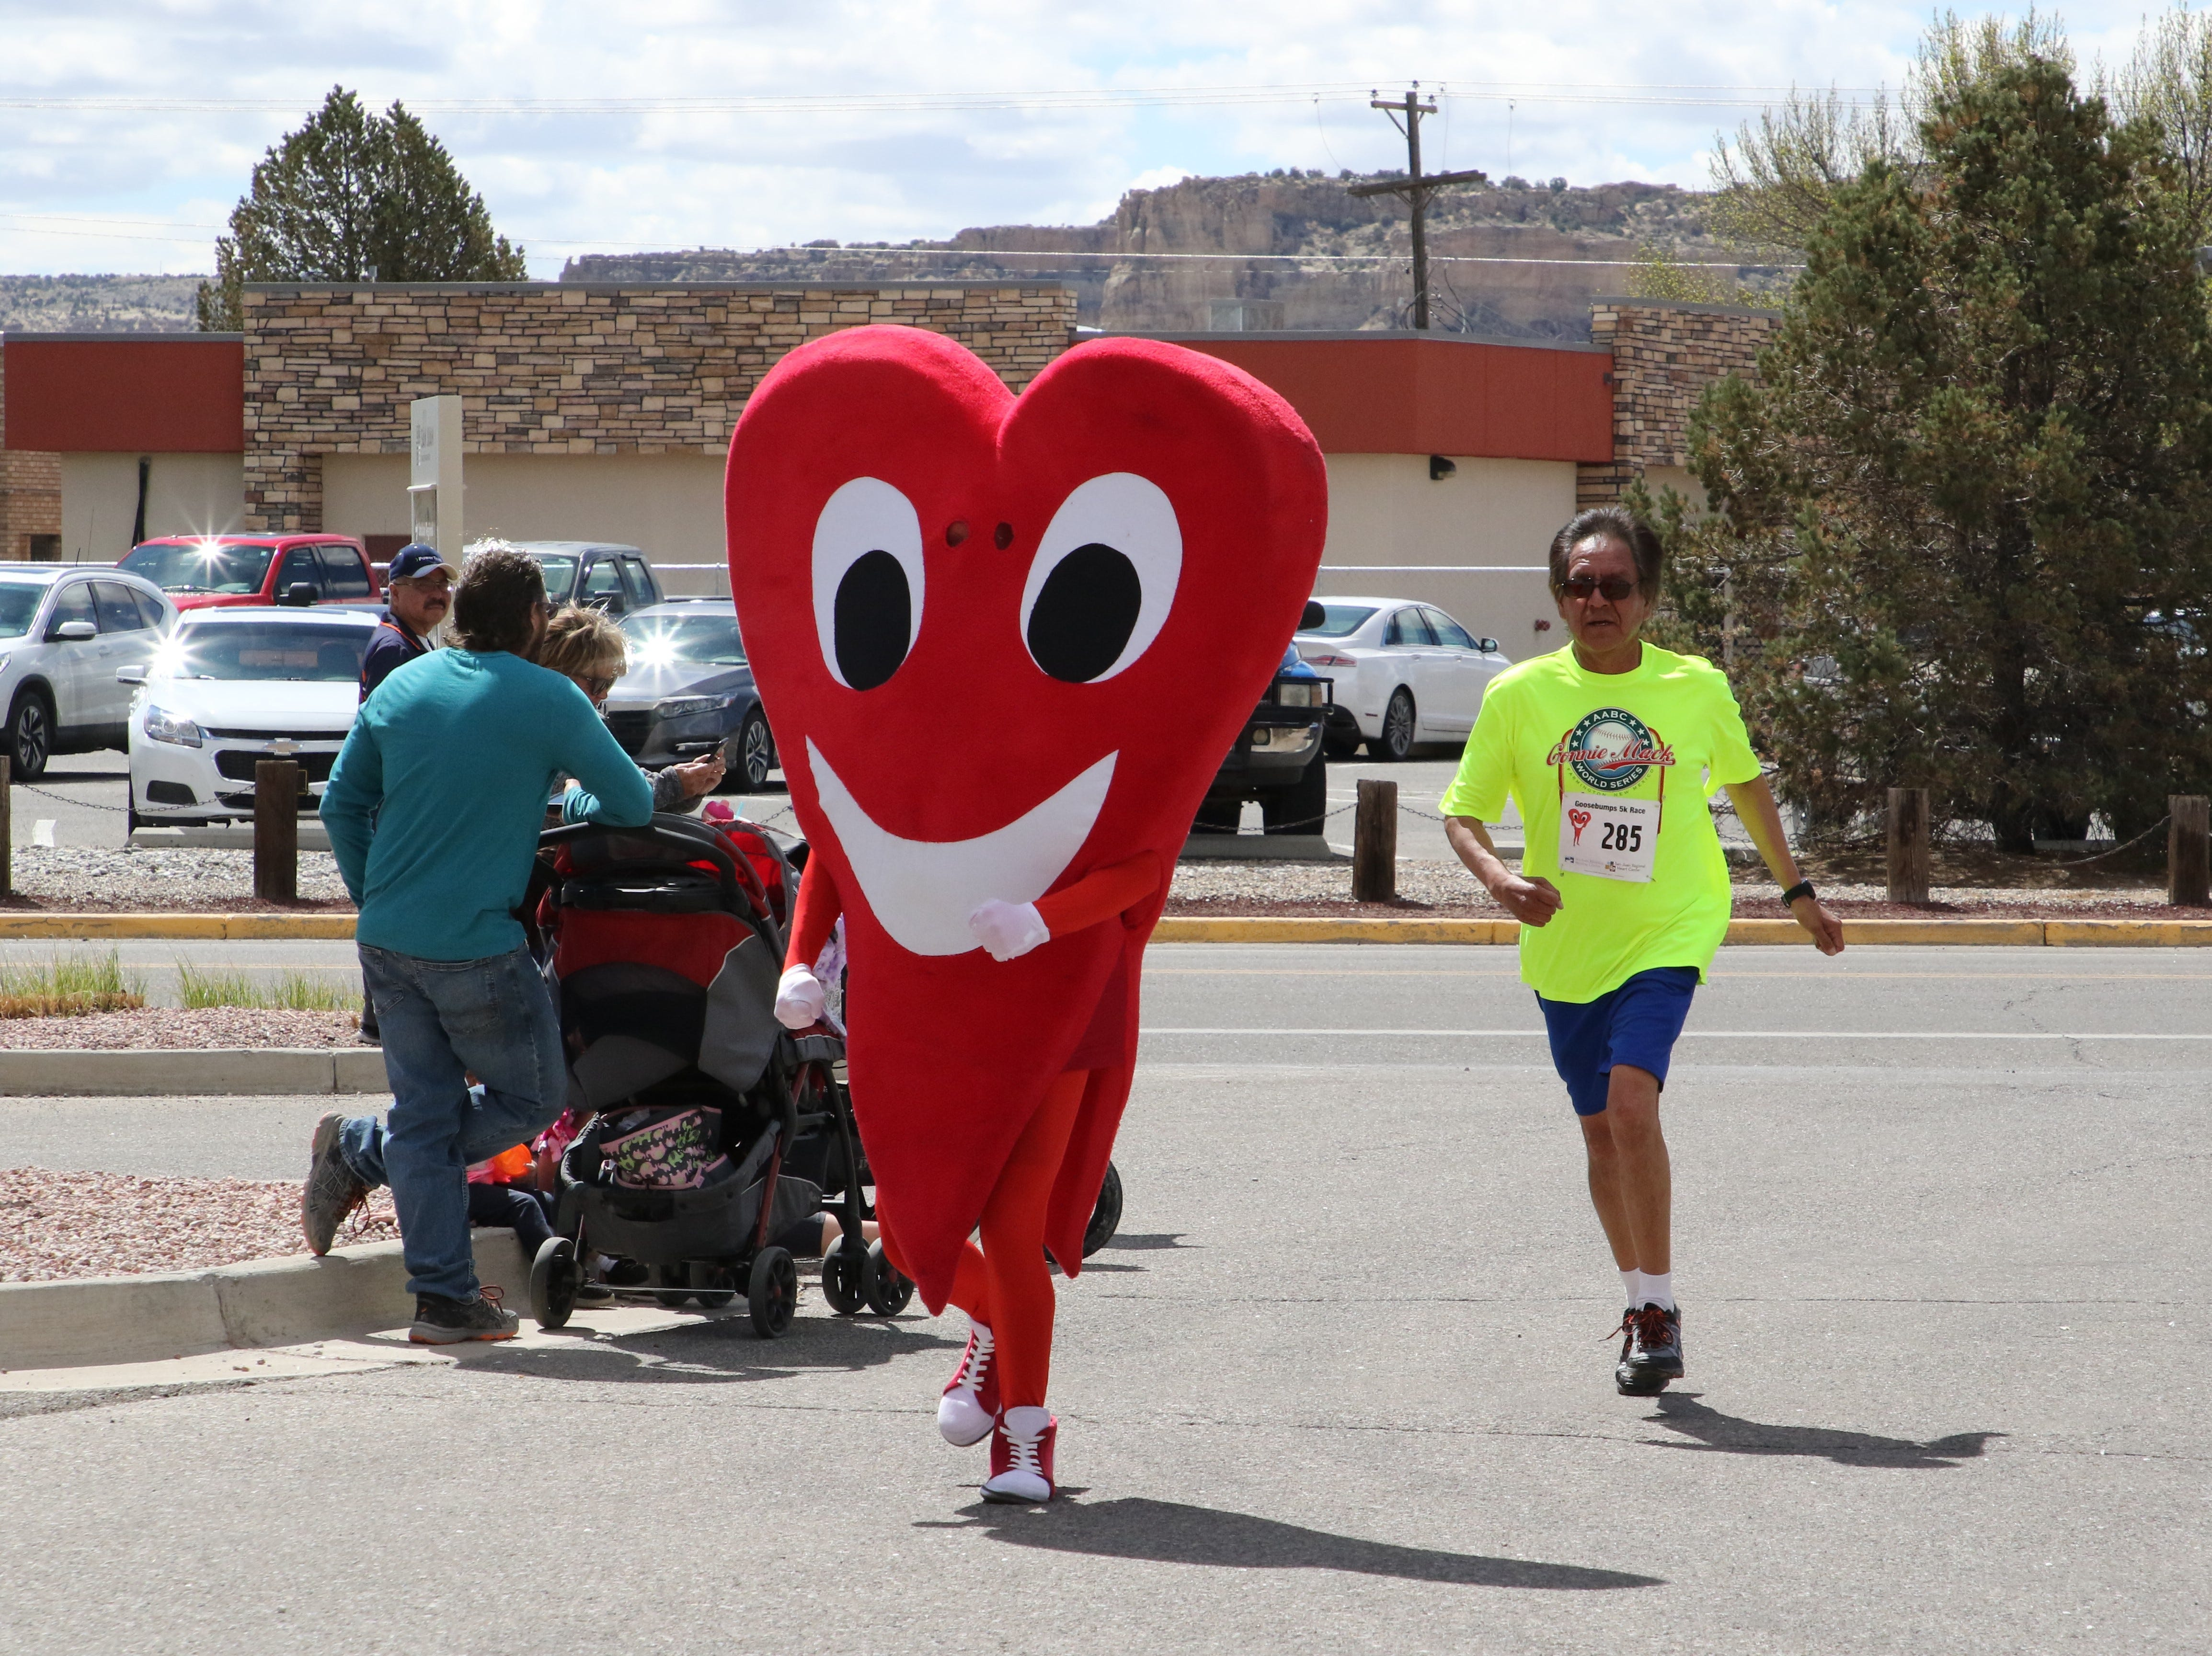 Mr. Juan Hart, the San Juan Regional Heart Center's mascot, runs with a participant on Saturday during the 11th annual A Fair of the Heart and Goosebump Race in Farmington.